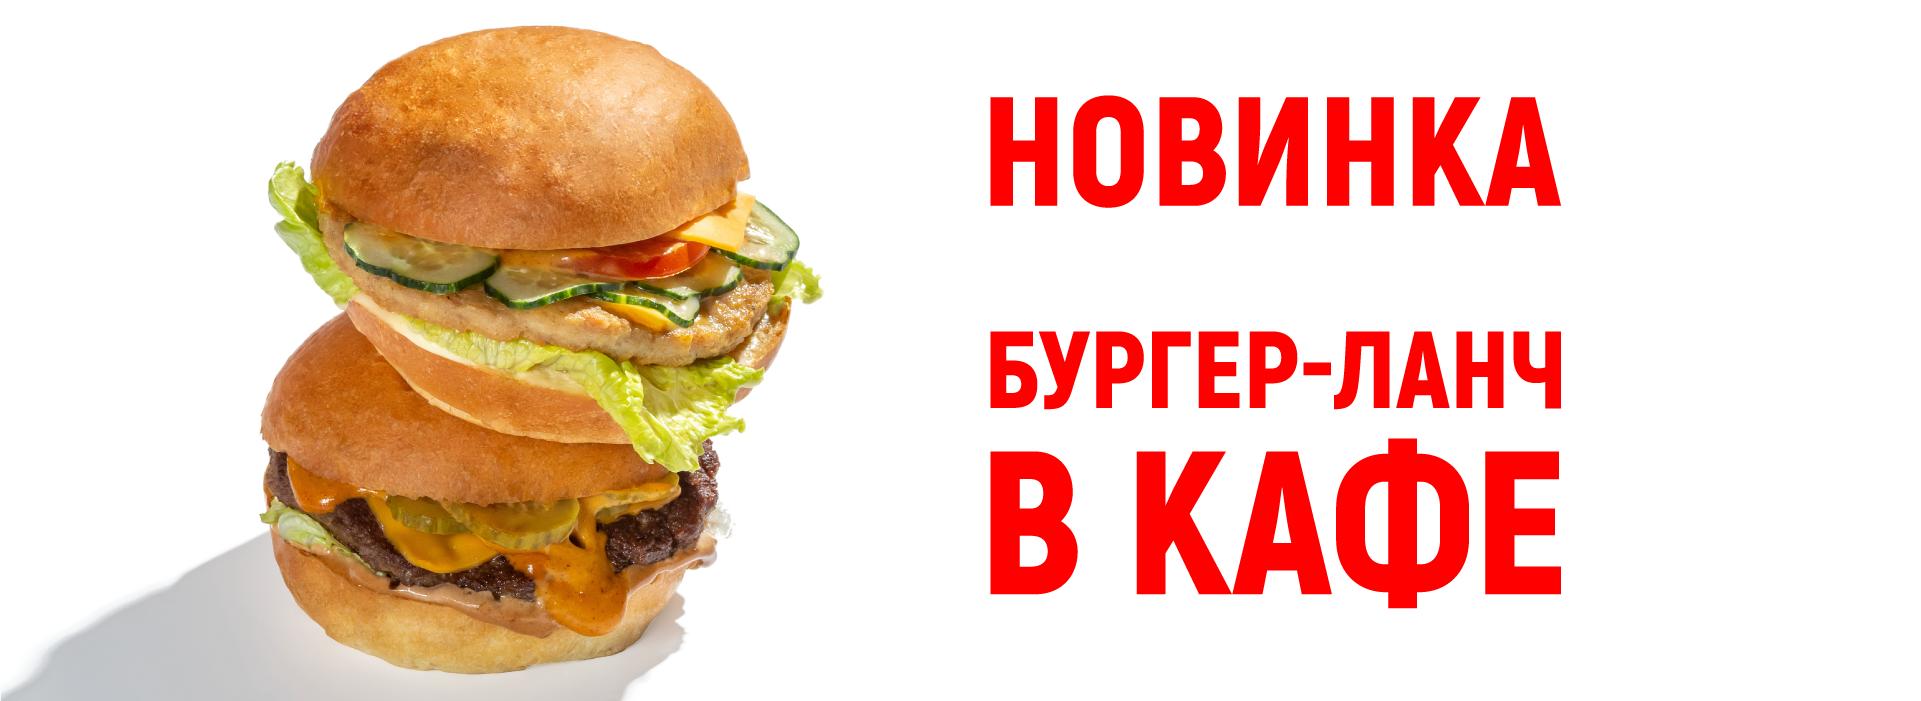 Burger-lunch_Slider_2021